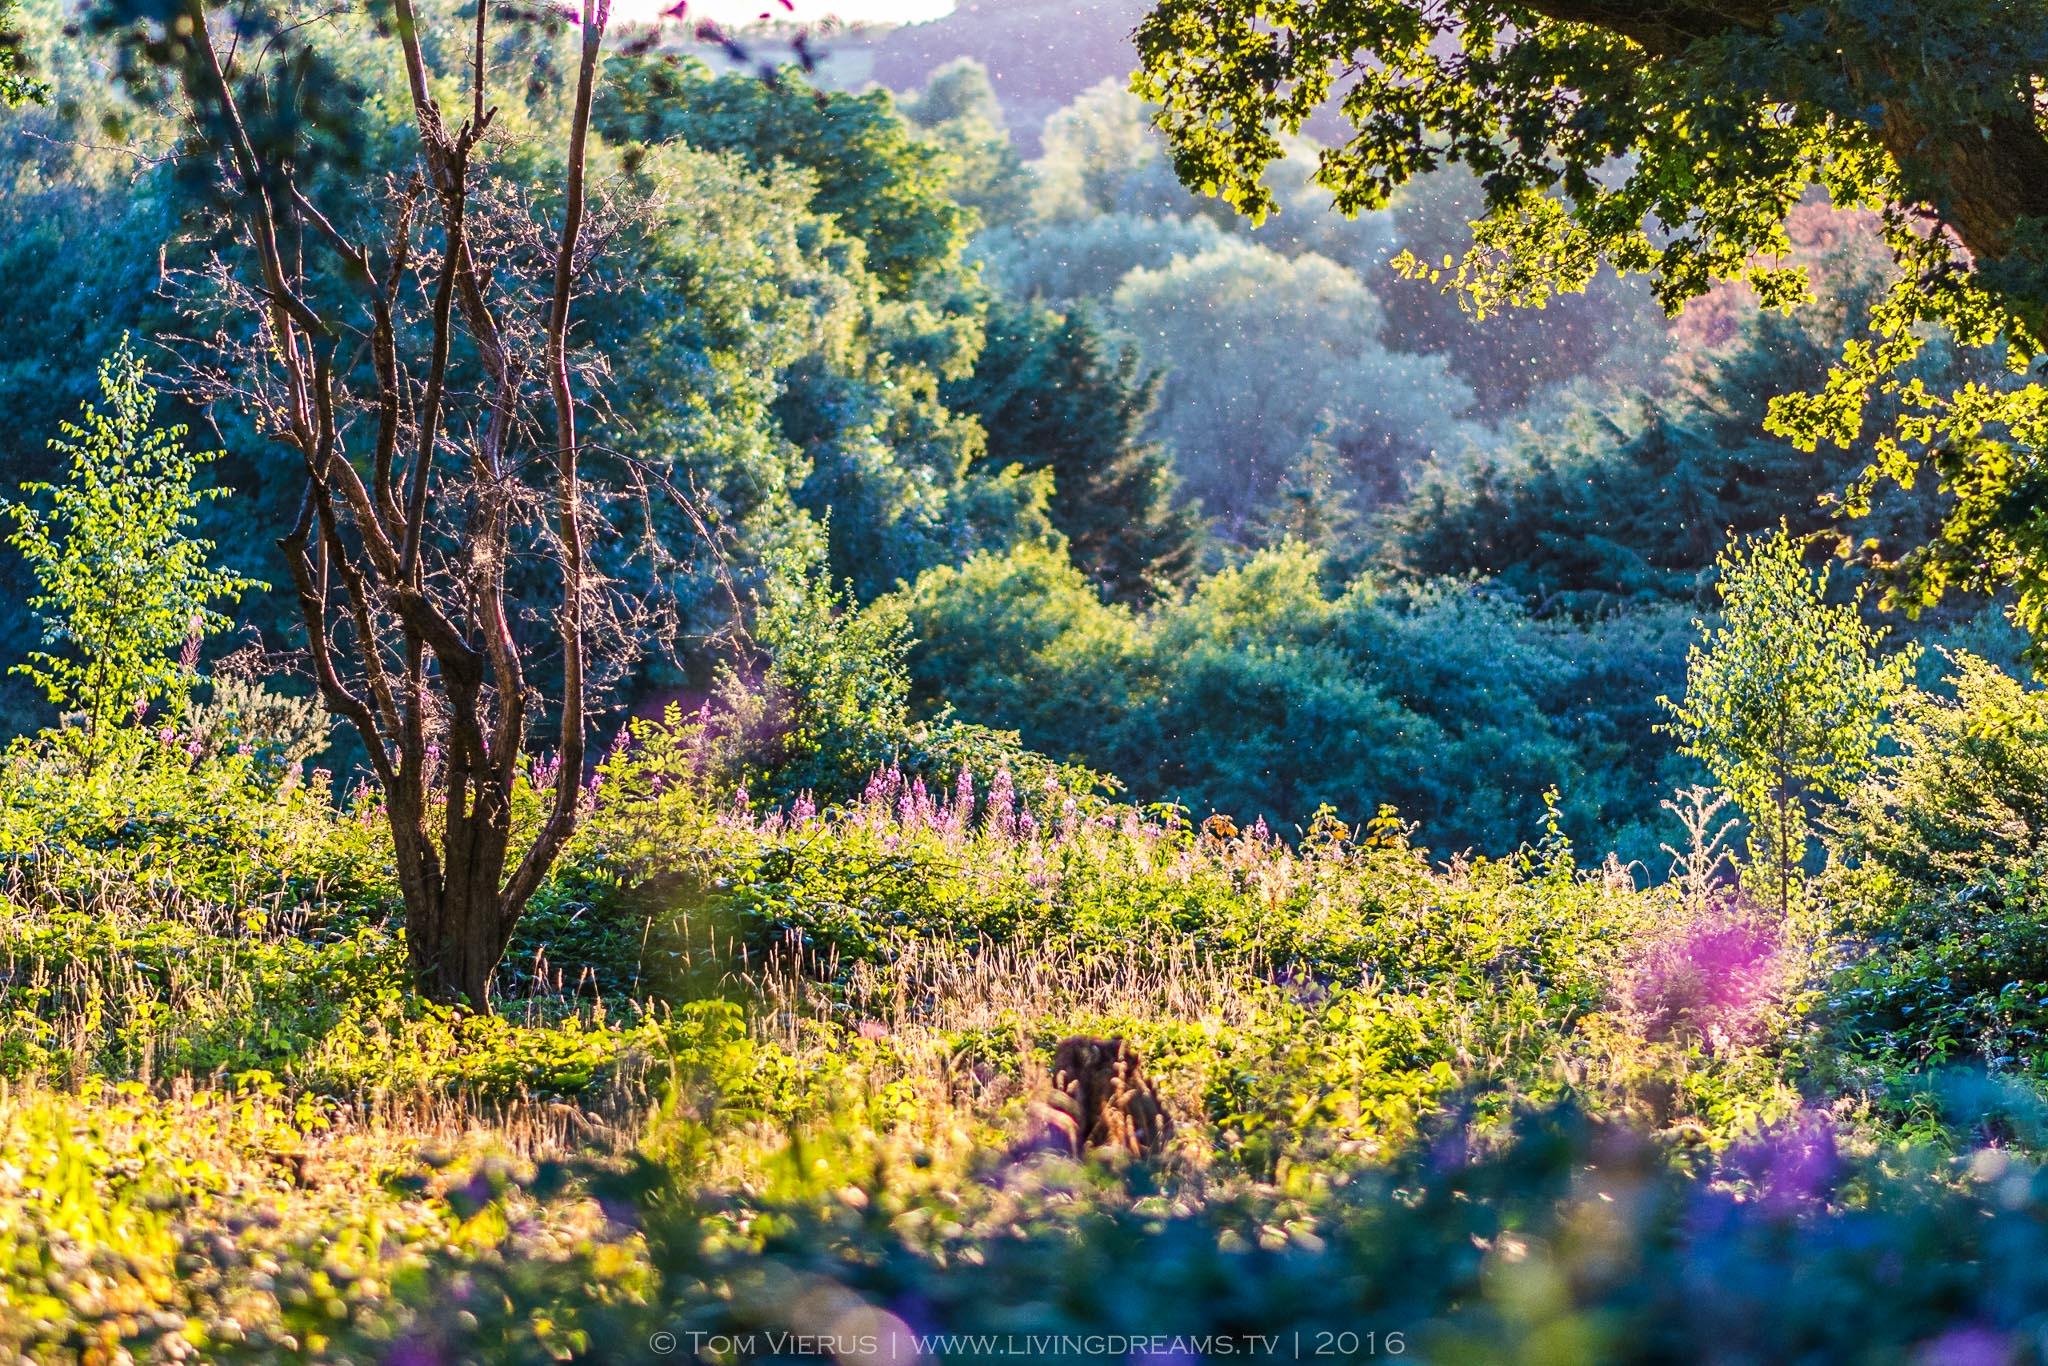 Nature, Landscape, Scenic, England, UK, Winchester